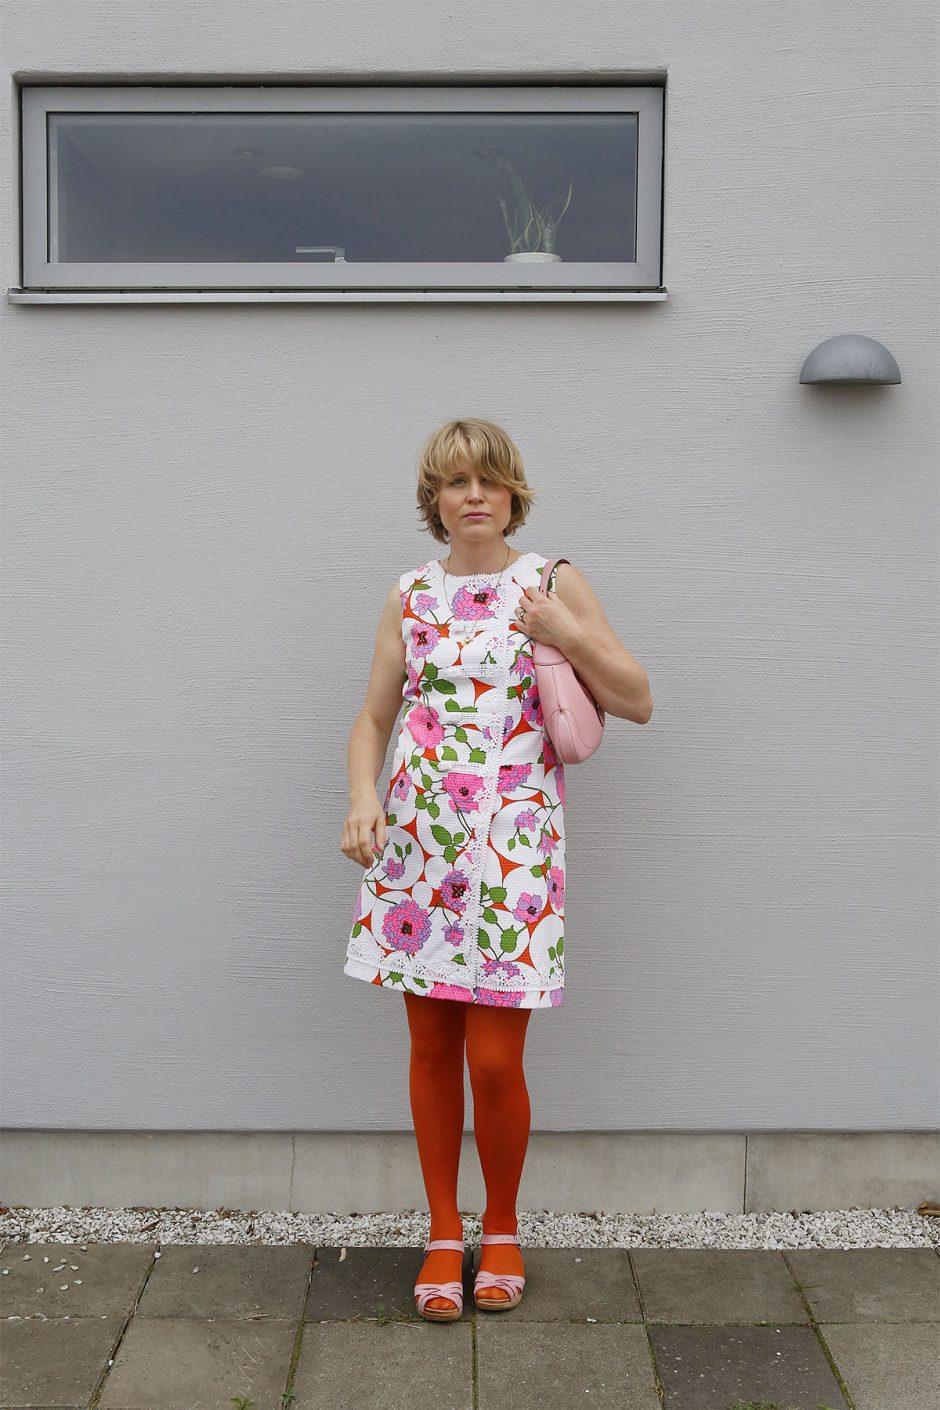 vintageklänning finland jackie-o